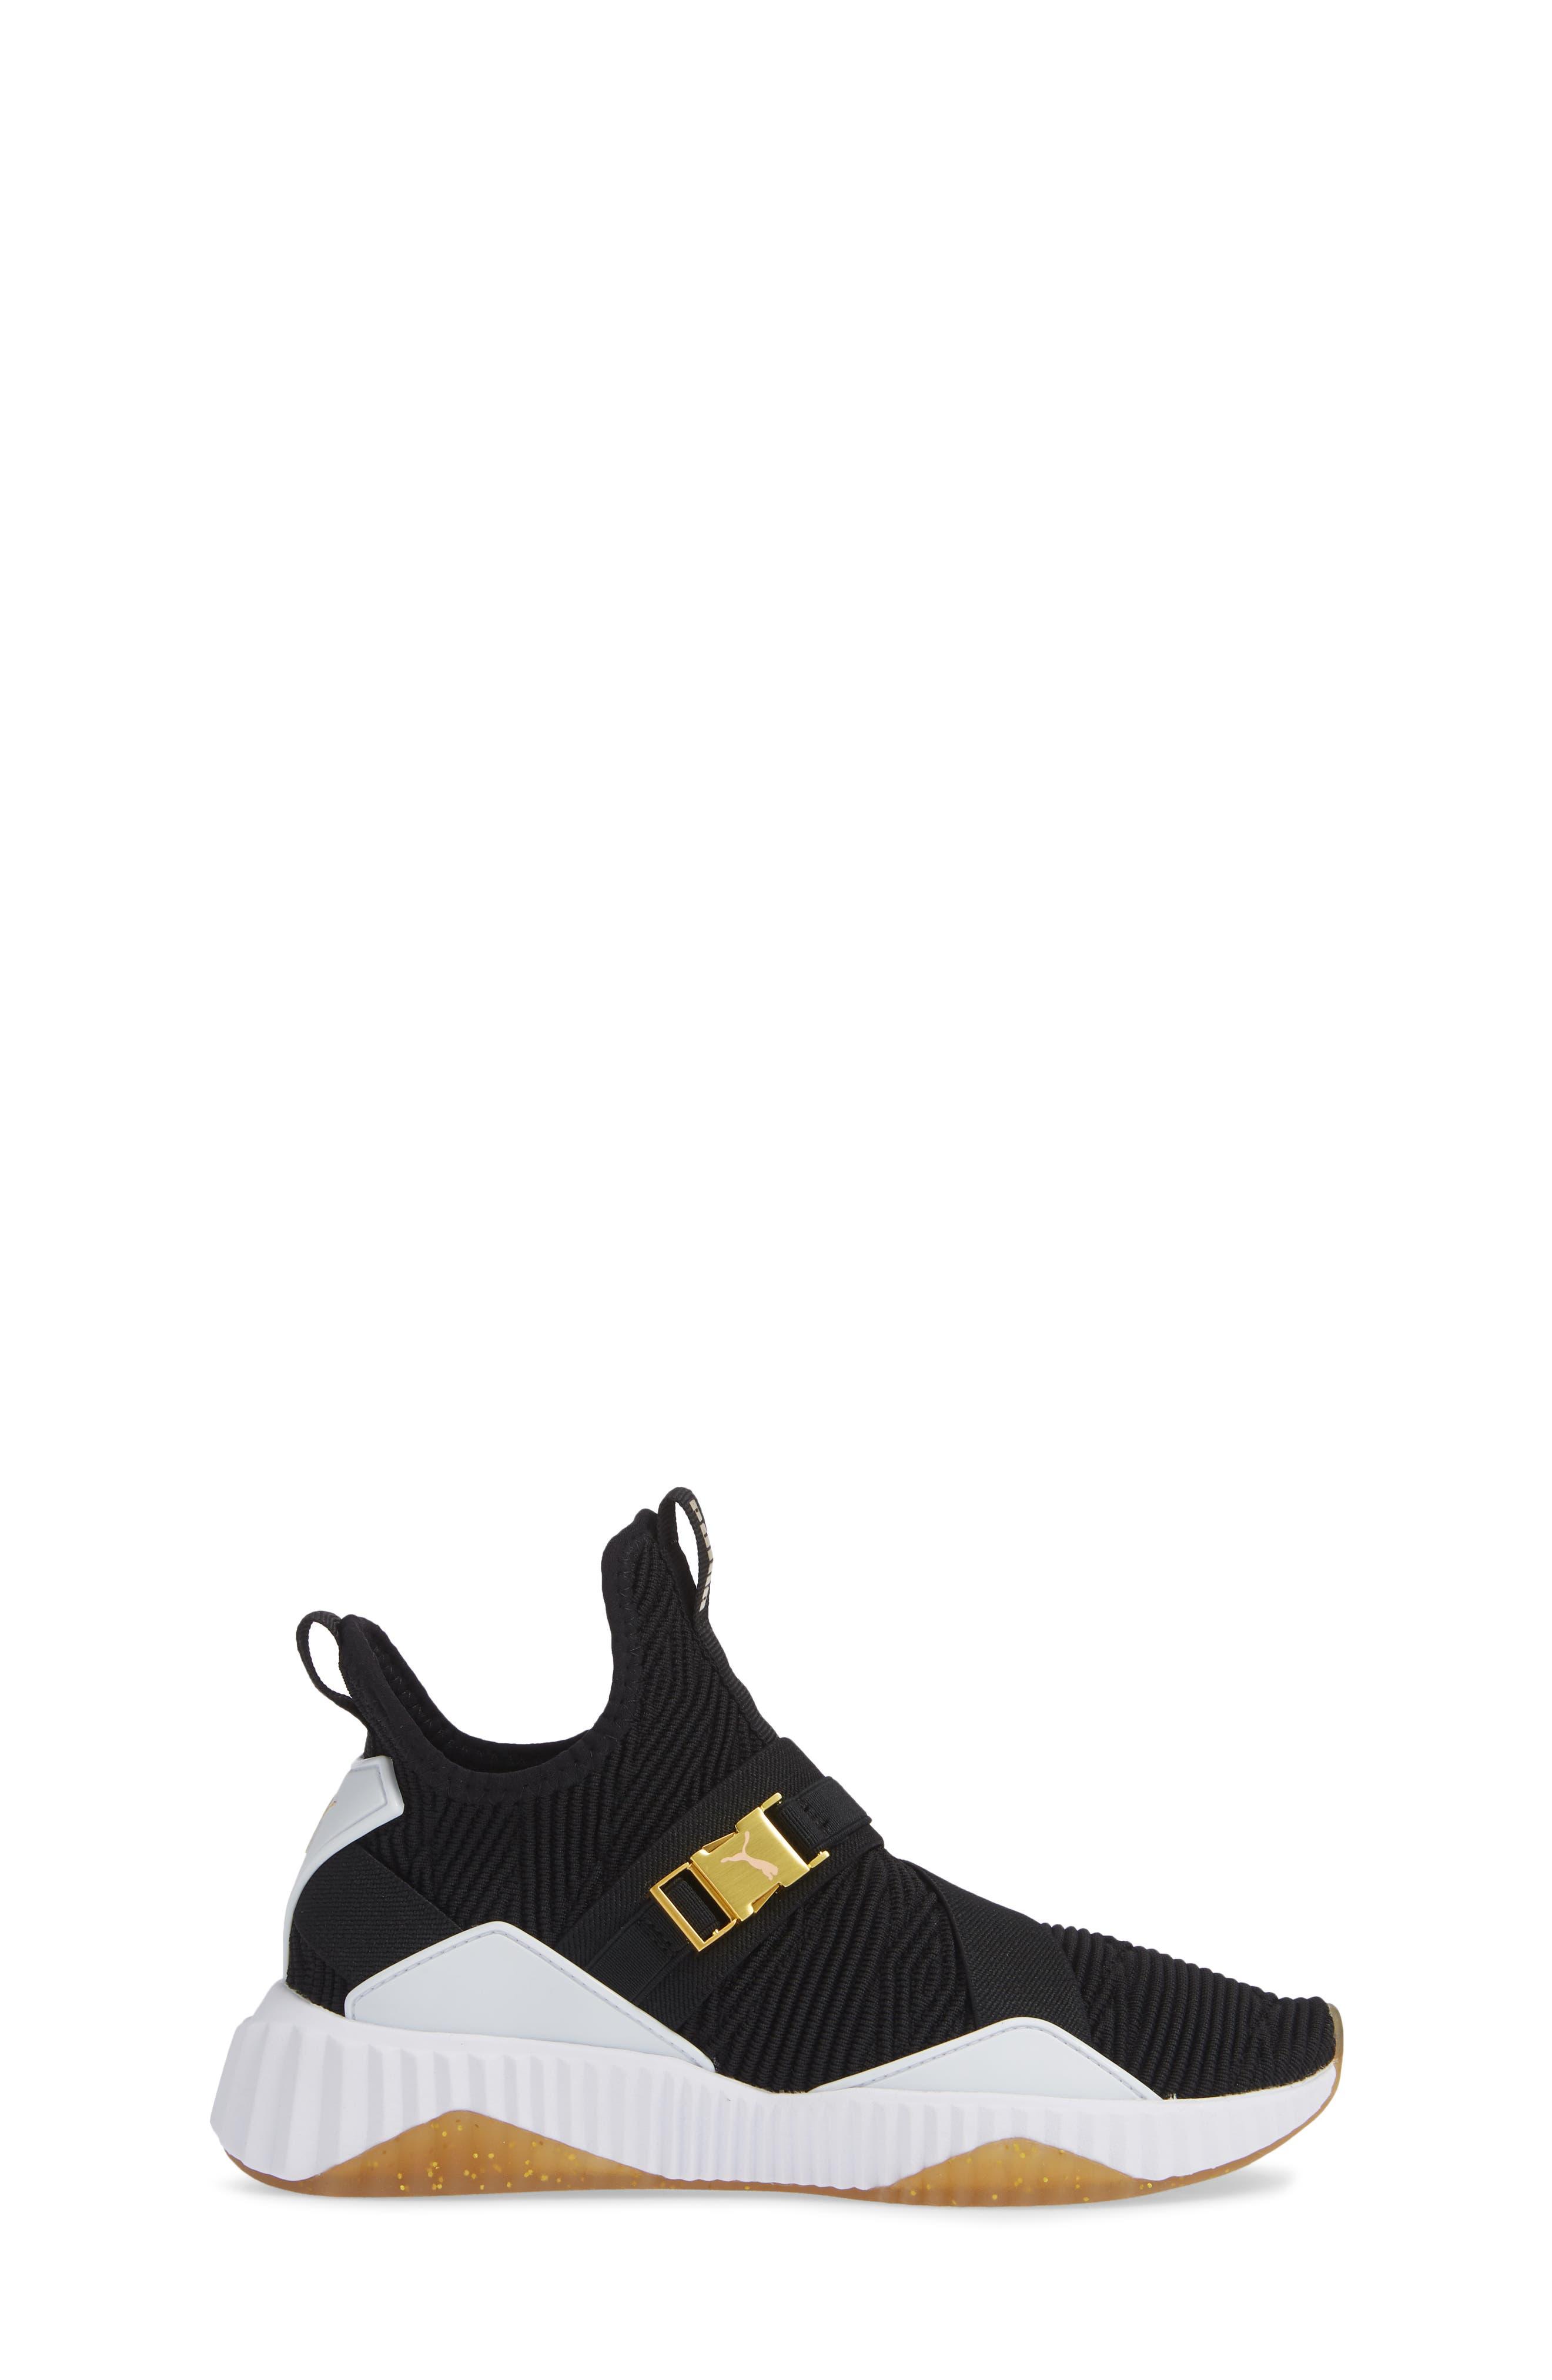 PUMA, Defy Mid Varsity Sneaker, Alternate thumbnail 3, color, BLACK/ METALLIC GOLD